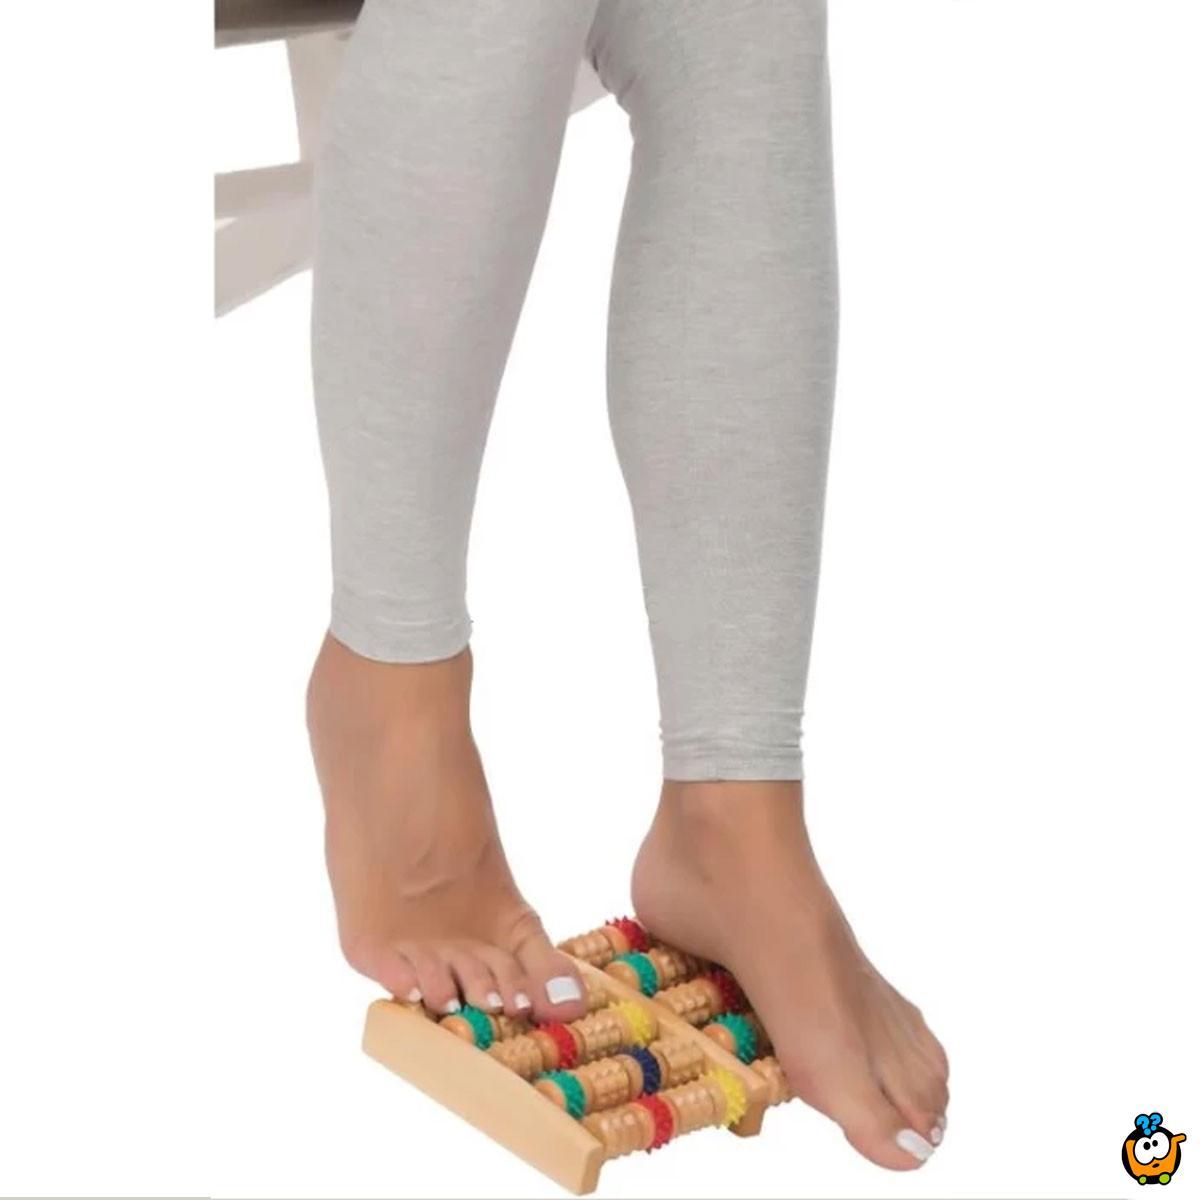 Dvostruku roler masazer za relaksaciju stopala